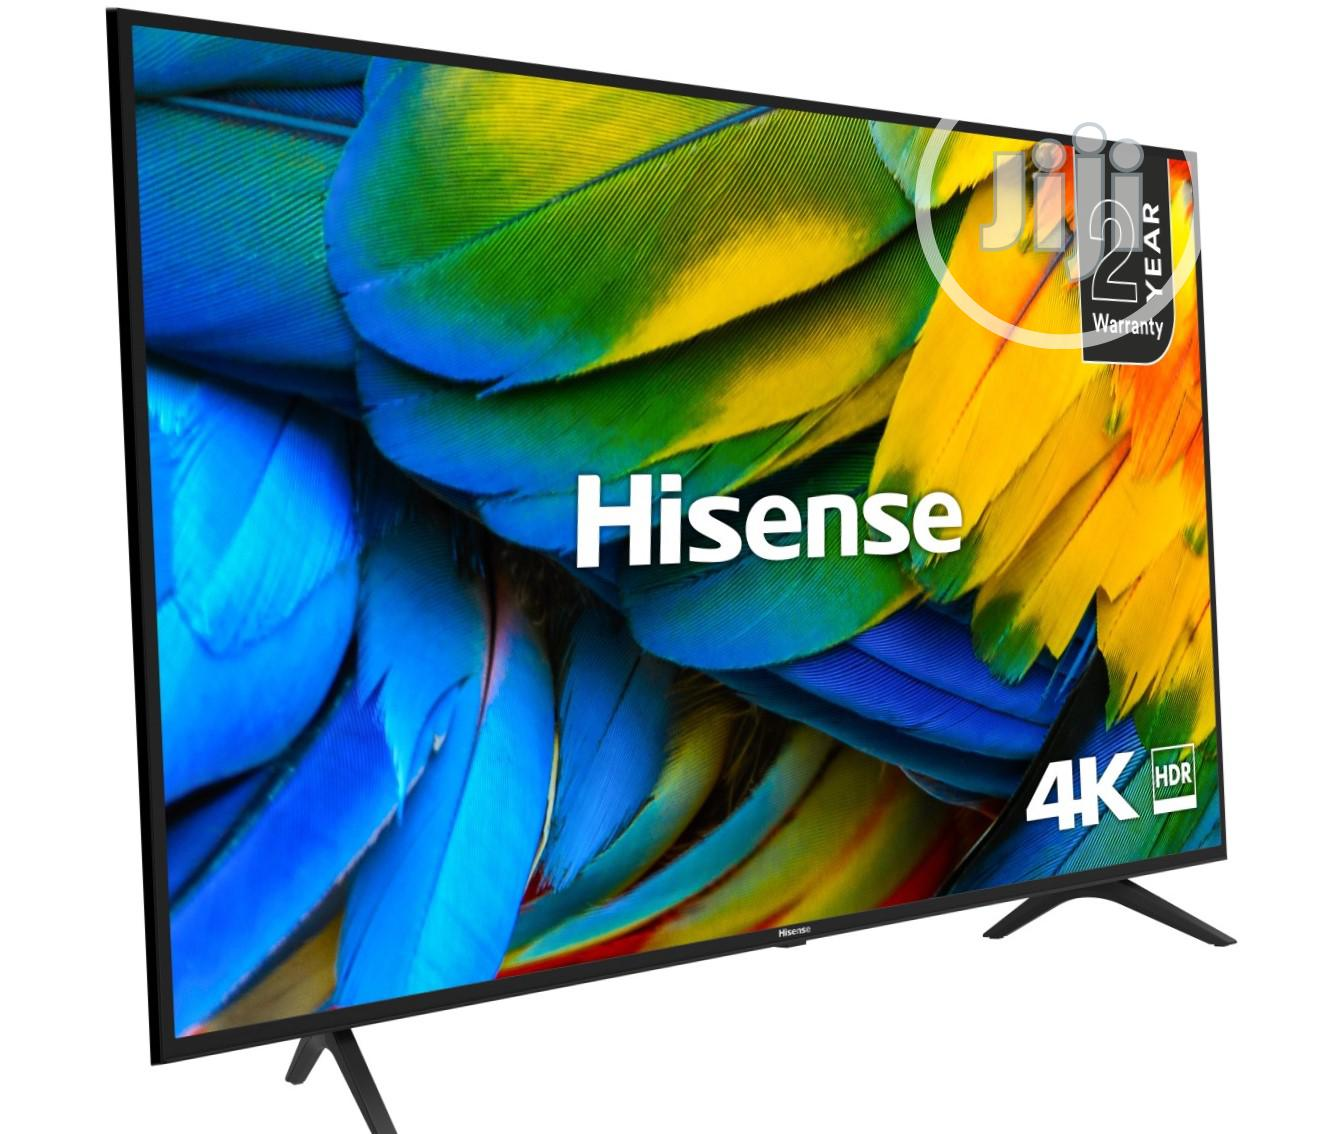 "65"" UHD Smart Television B7100 - Hisense D111"